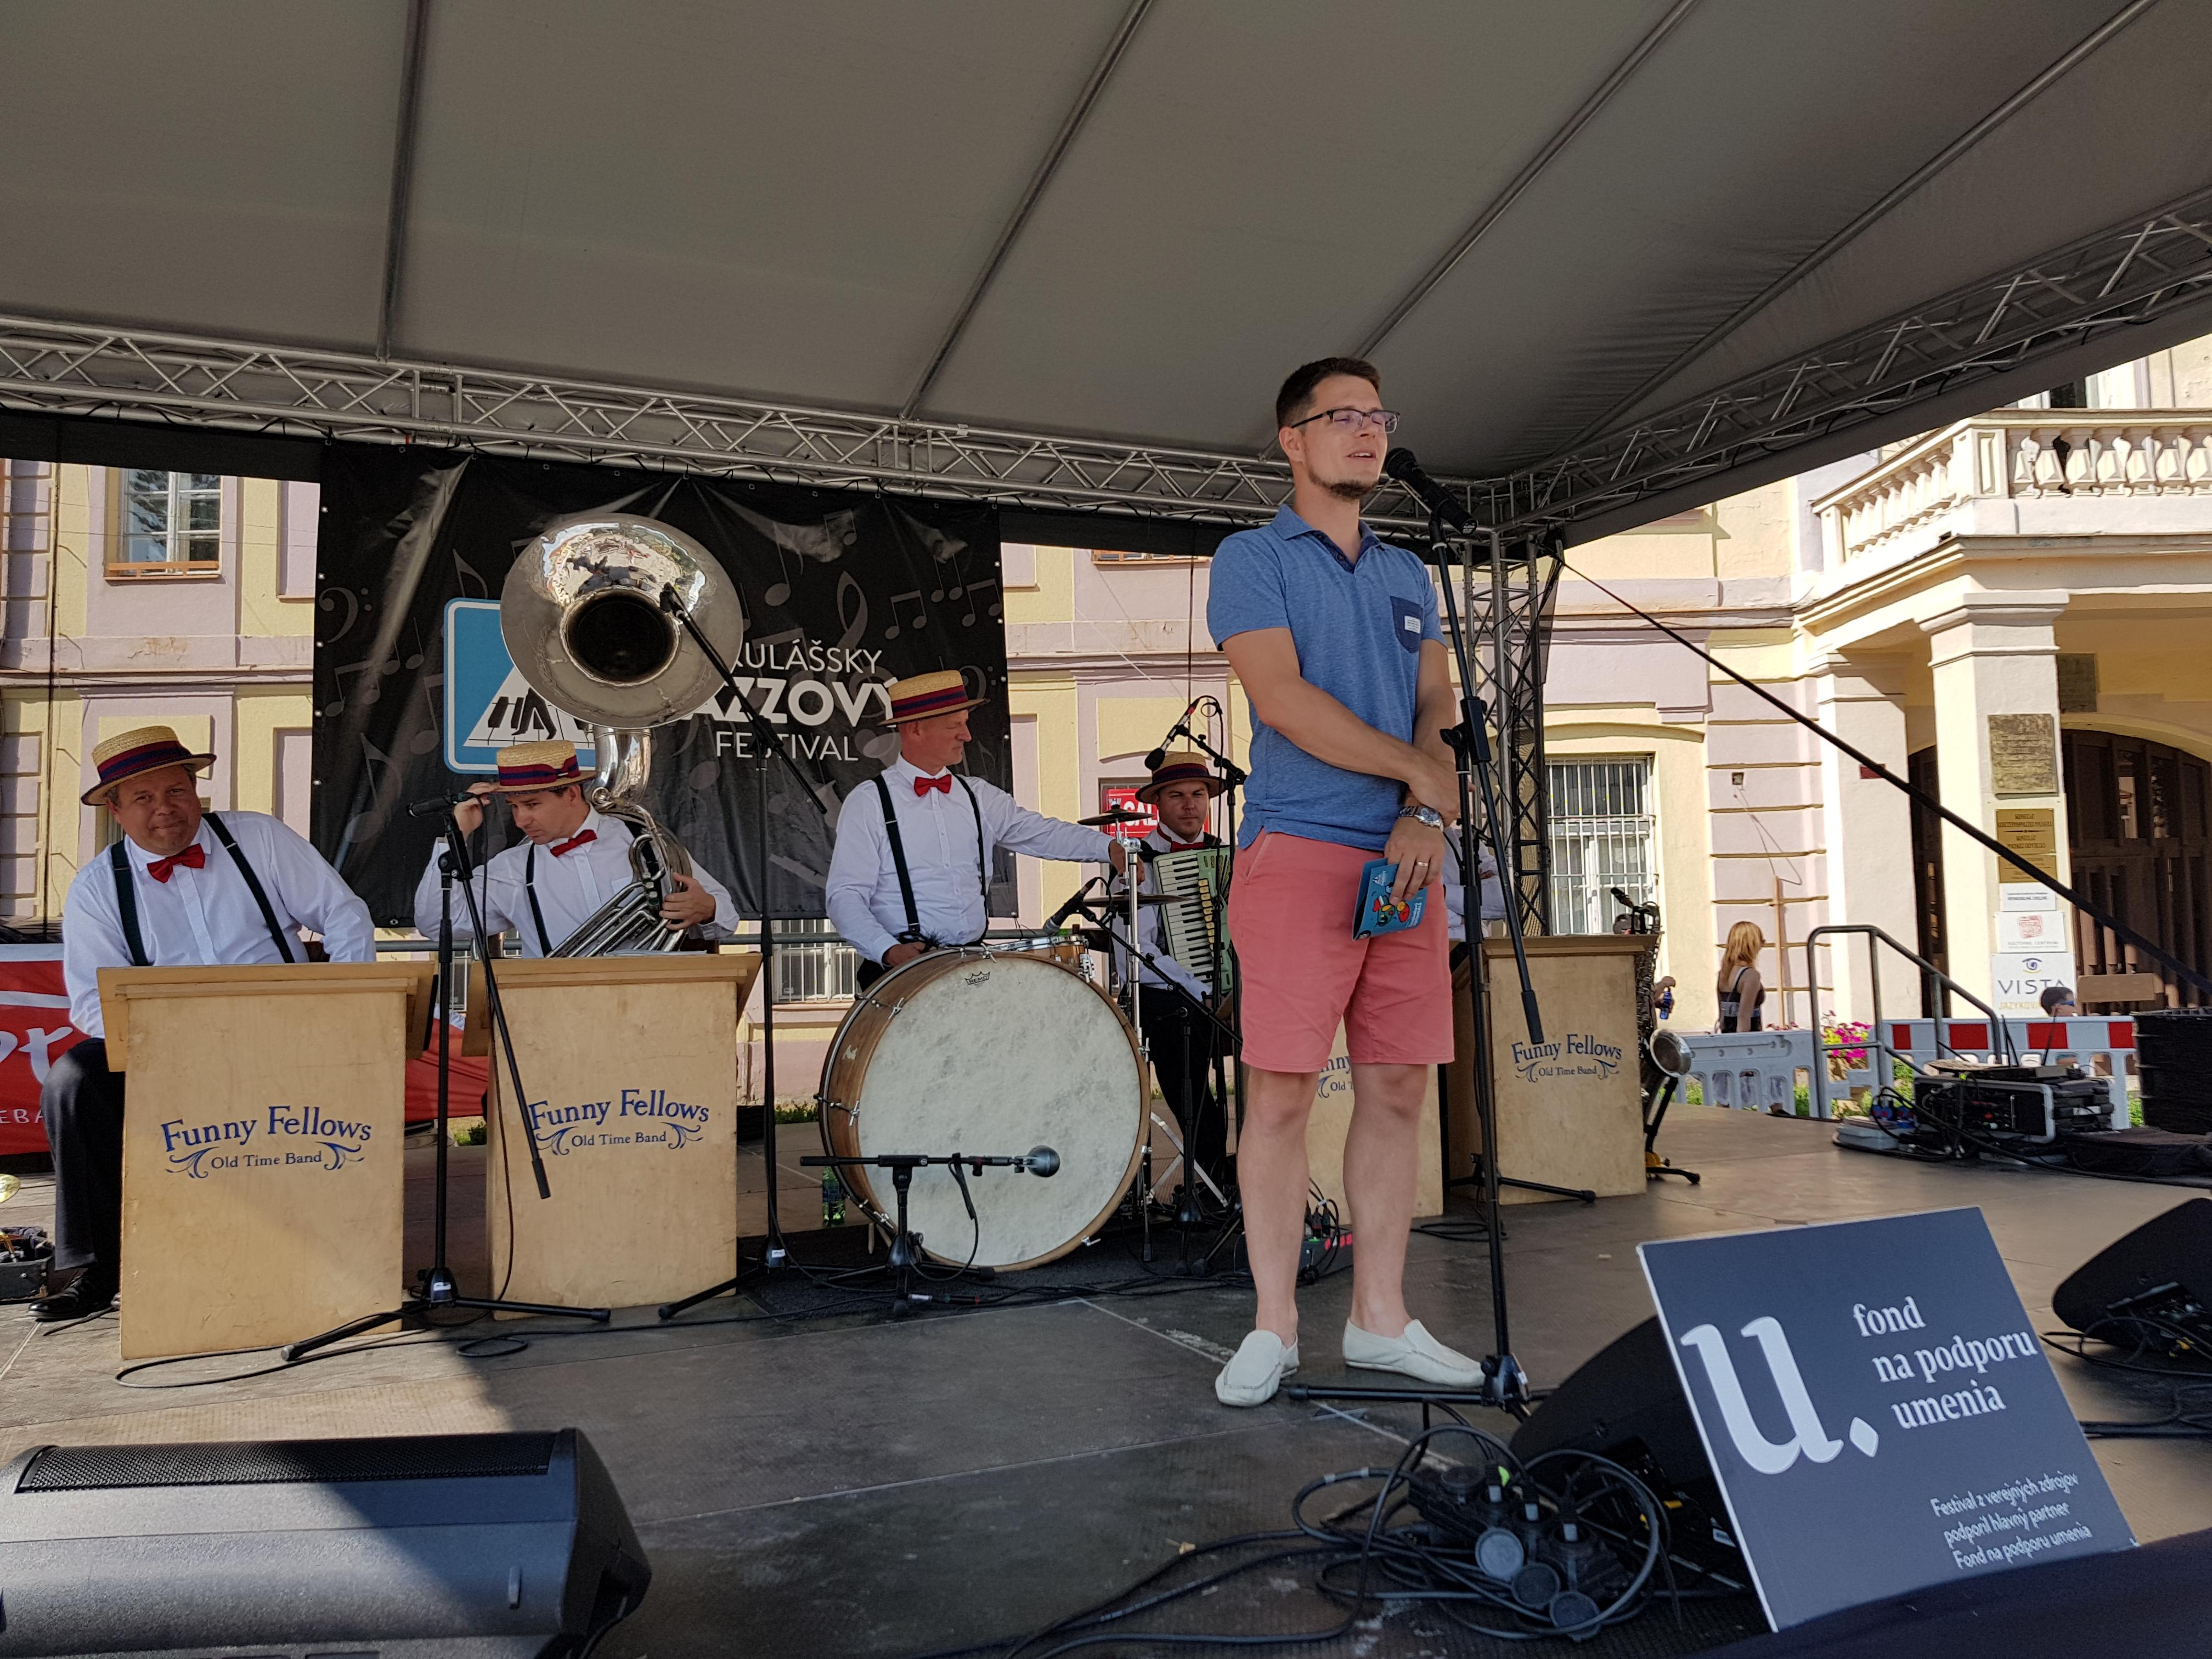 Mikulášsky Jazzový Festival štartoval na námestí